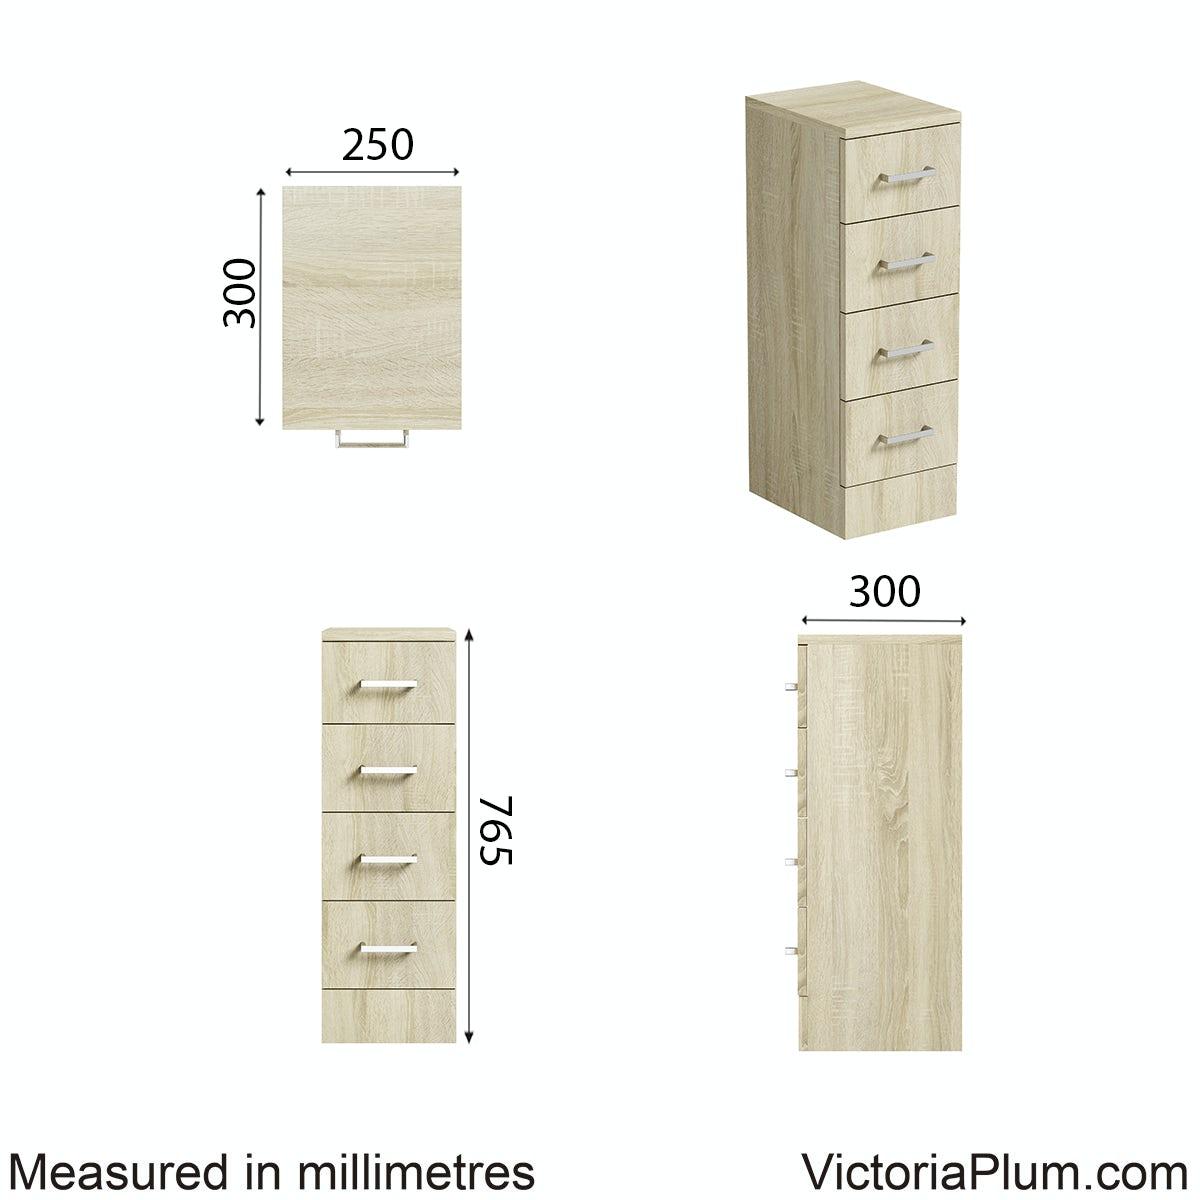 Dimensions for Orchard Eden oak multi drawer unit 300mm